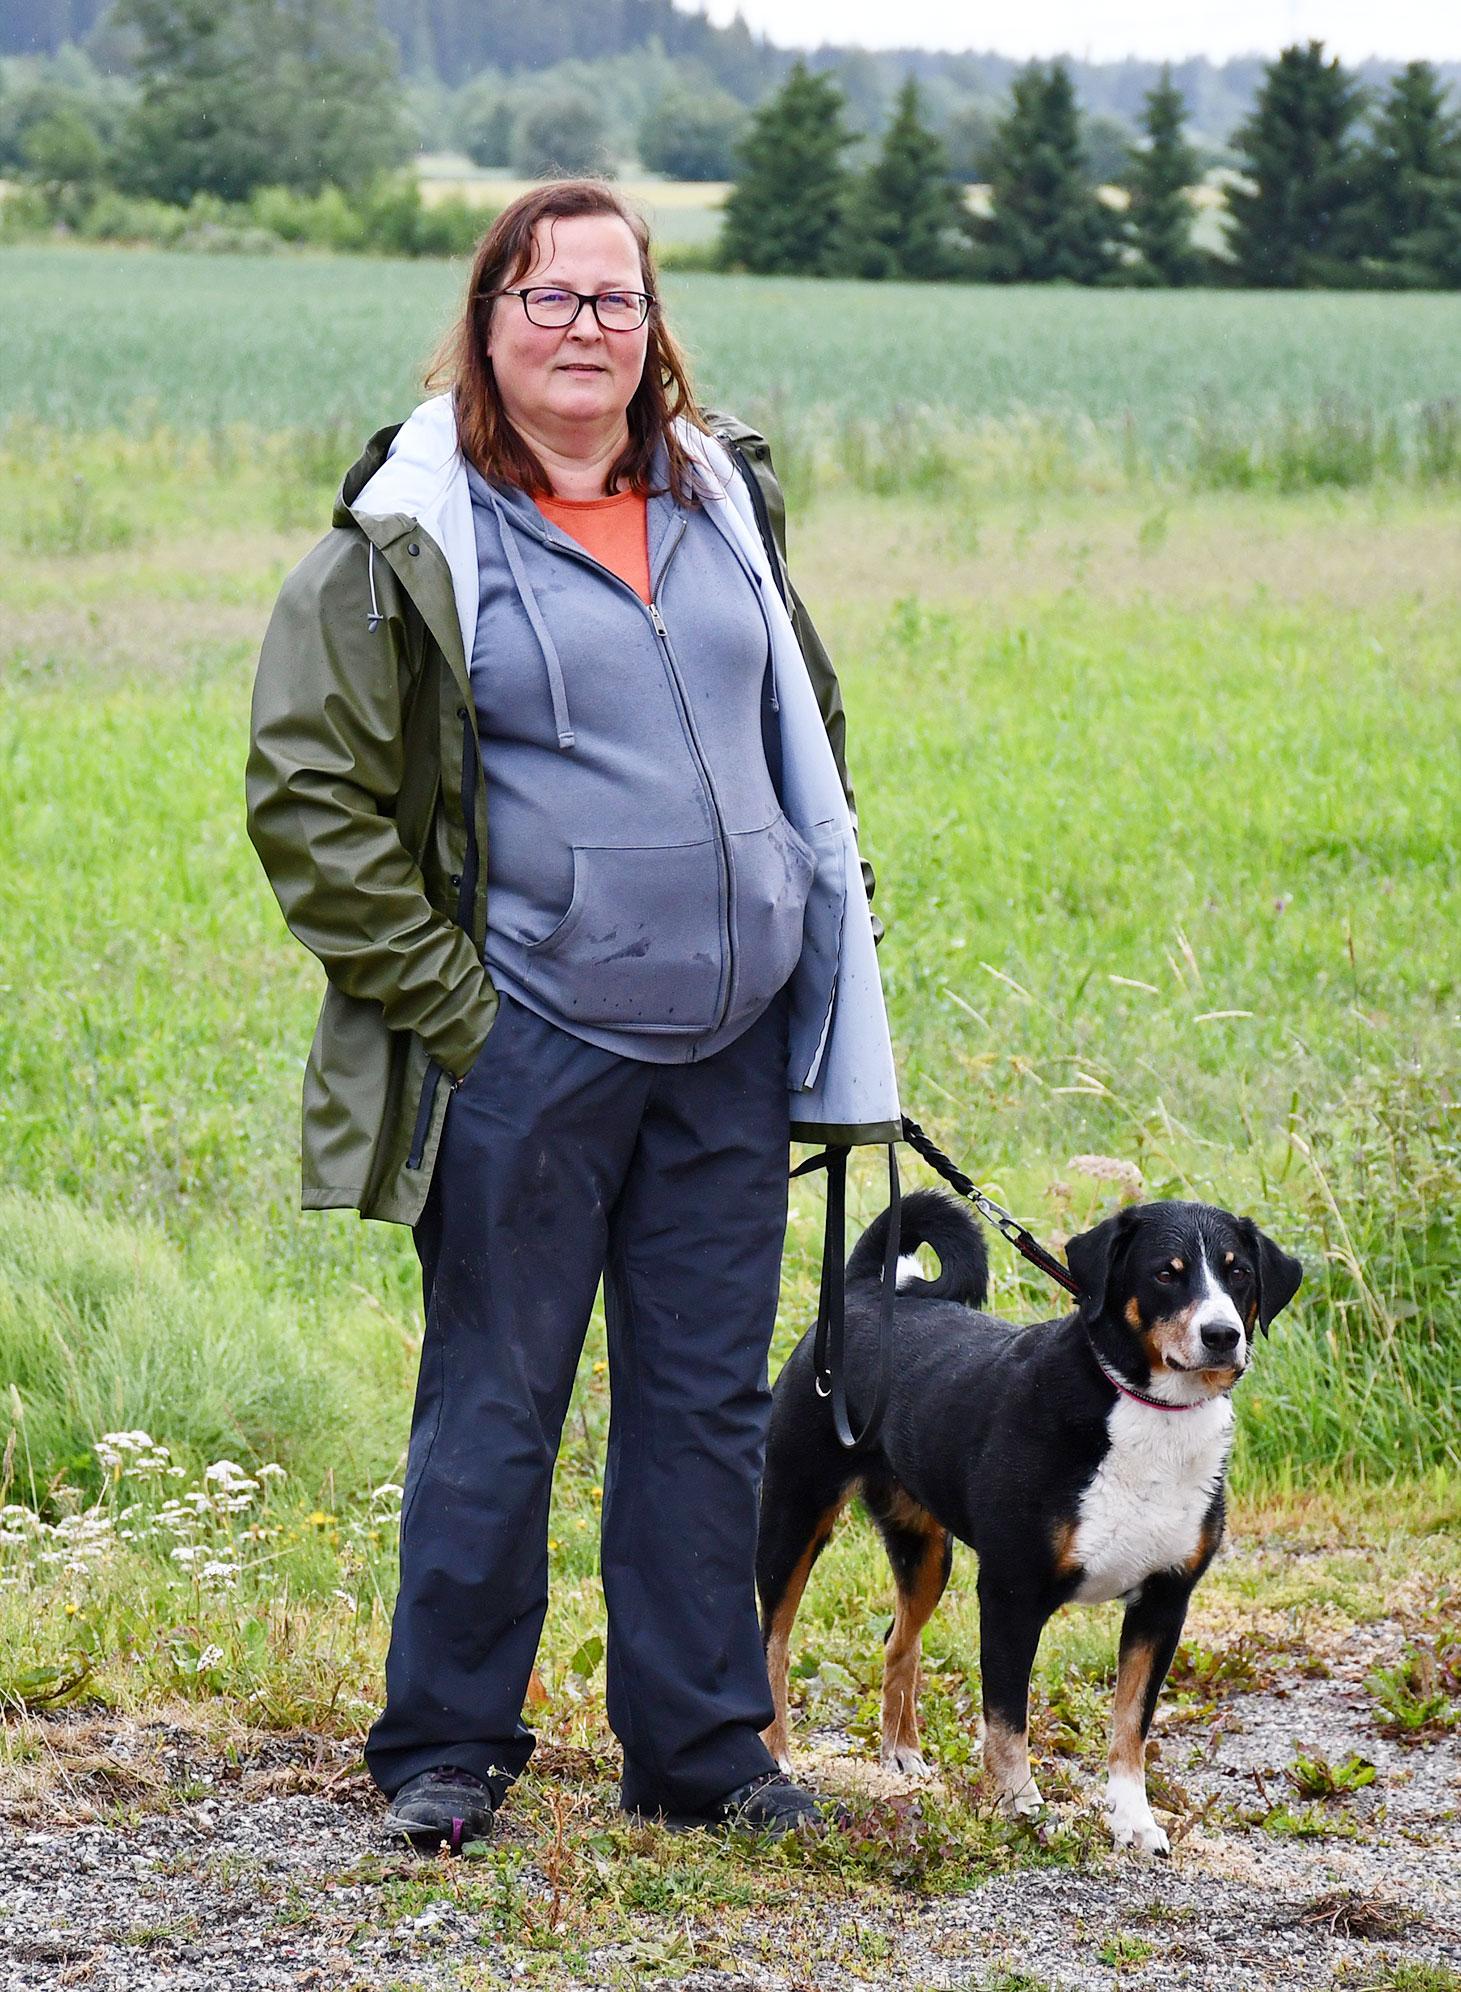 Taina Lestelin mit ihrem Hund.